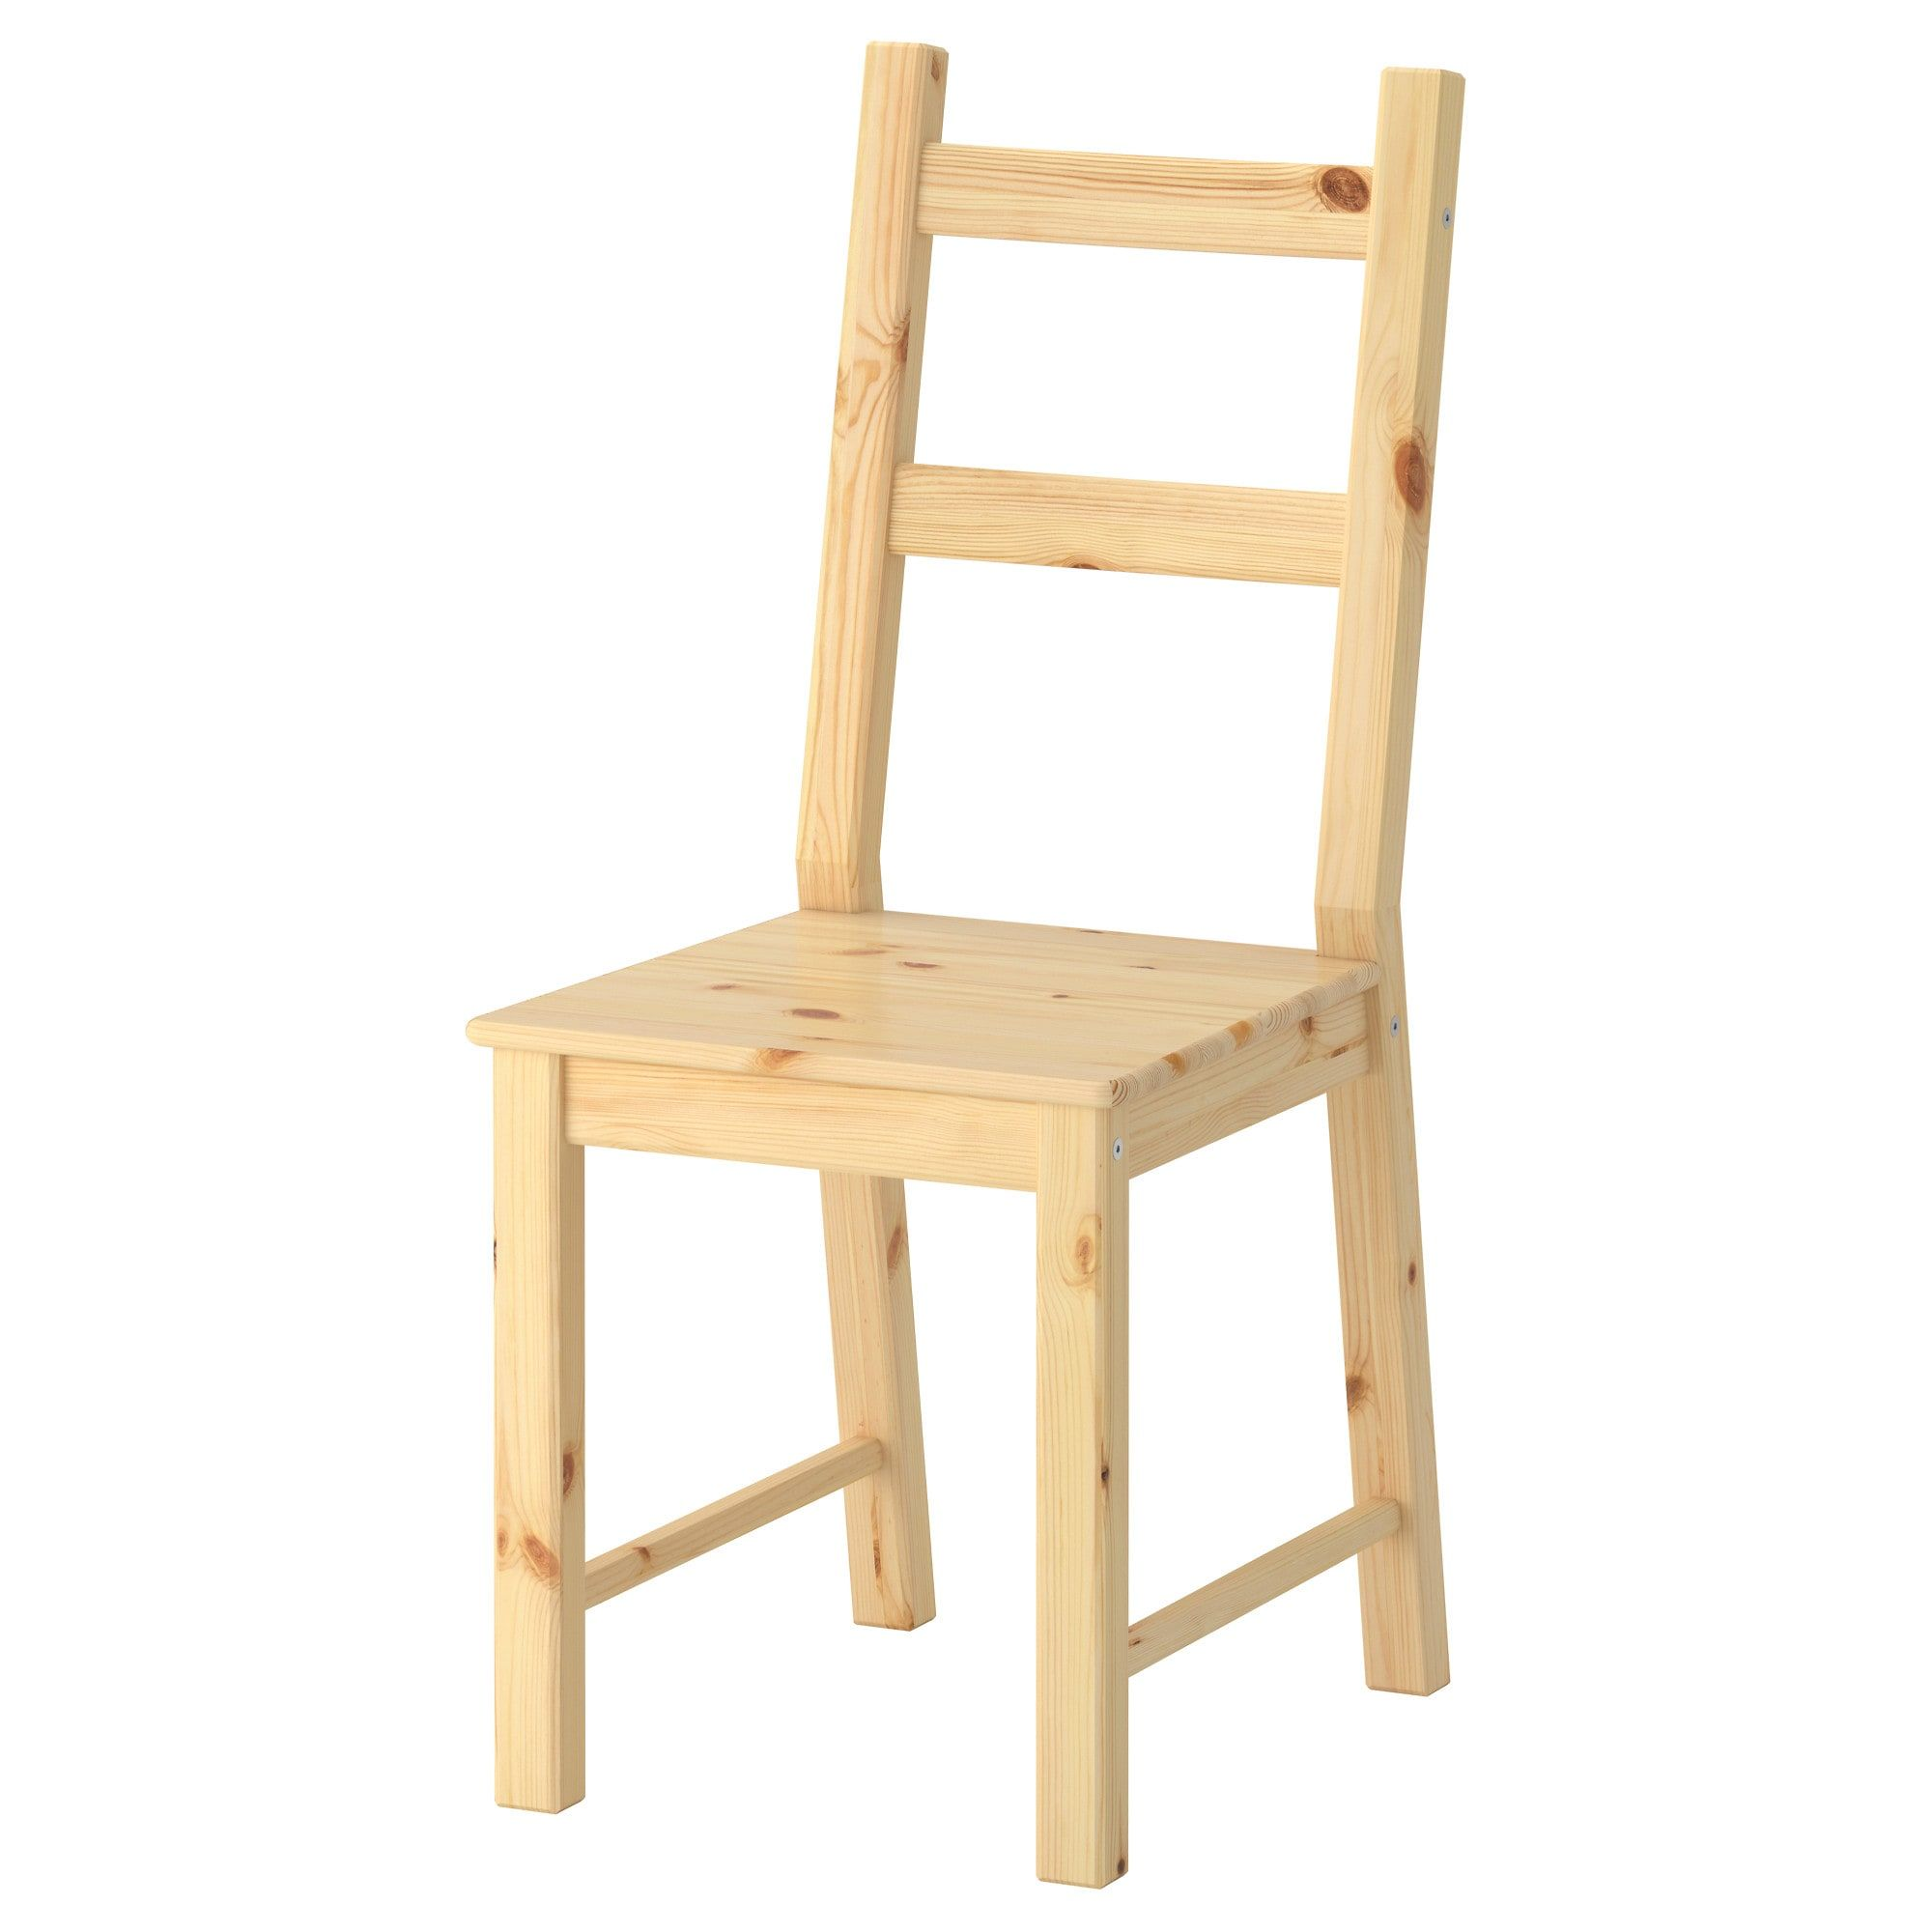 IKEA ODGER White, Beige Chair Eetkamerstoelen